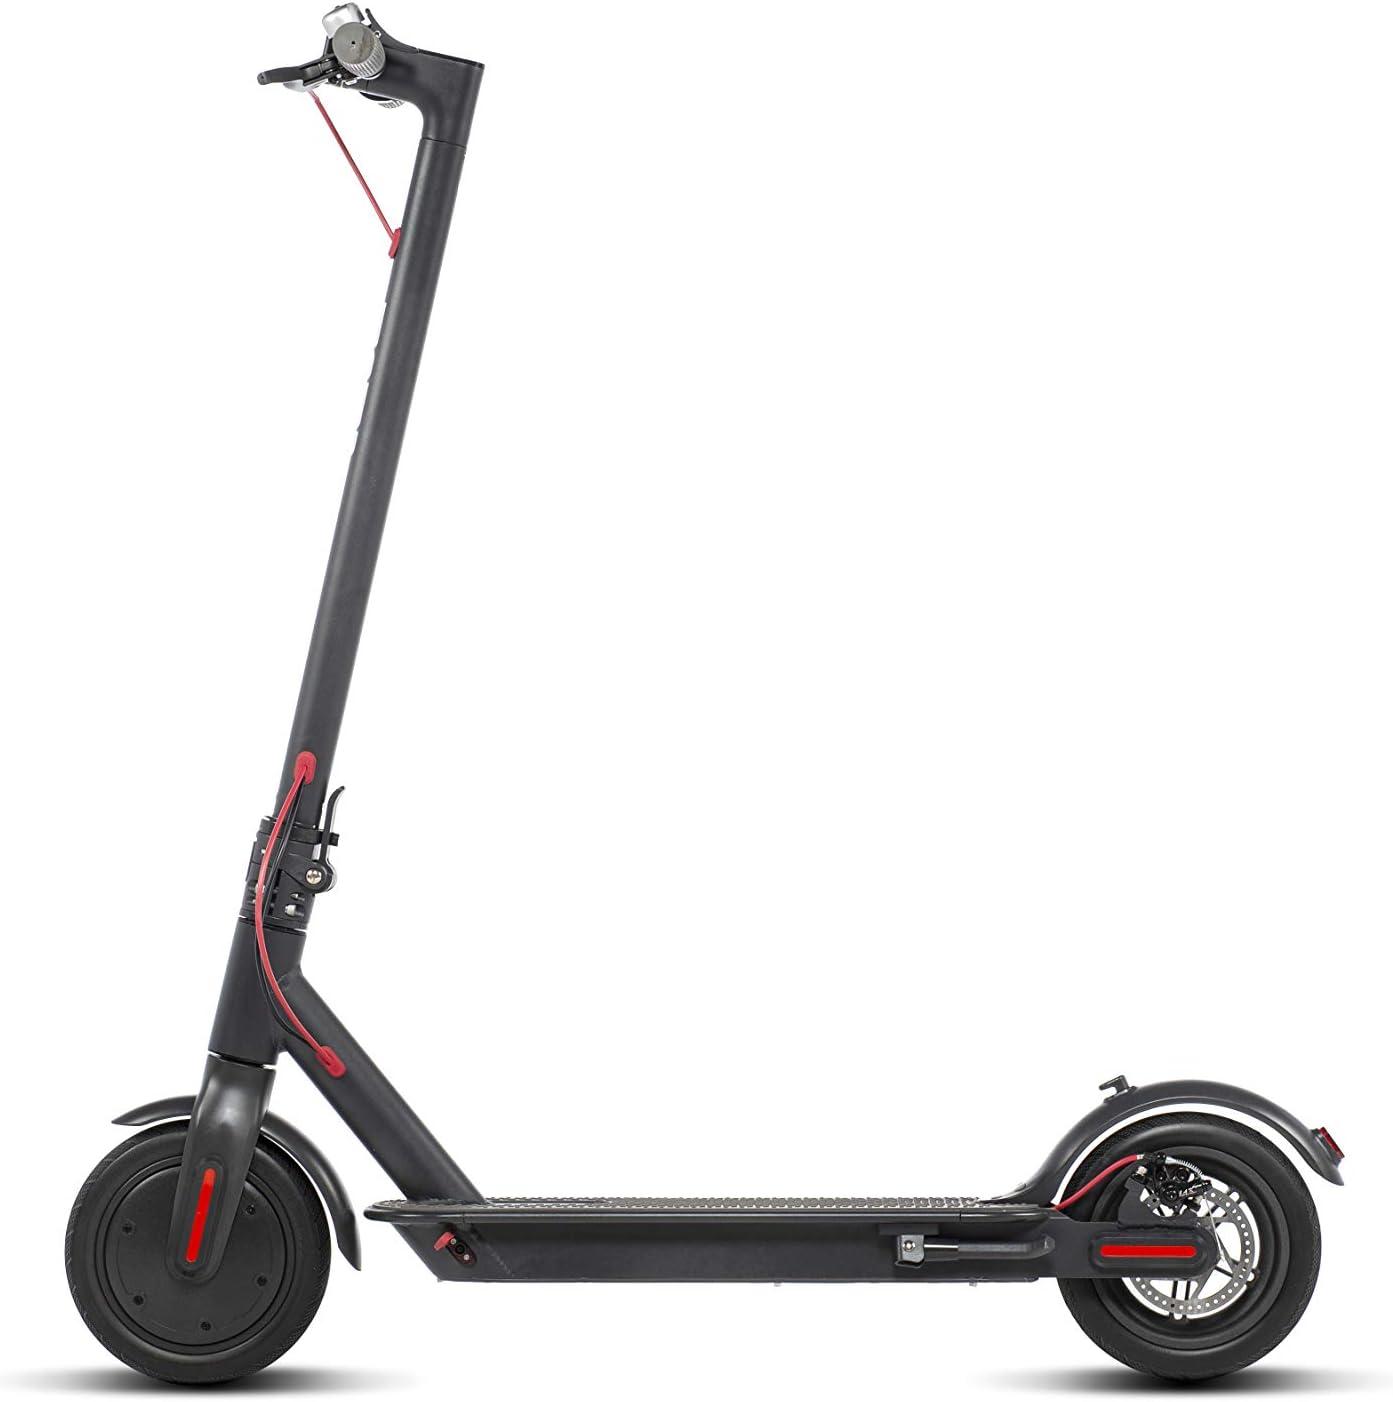 Comprar Moma Bikes Patinete Eléctrico Plegable E-500 Ruedas Macizas 8,5